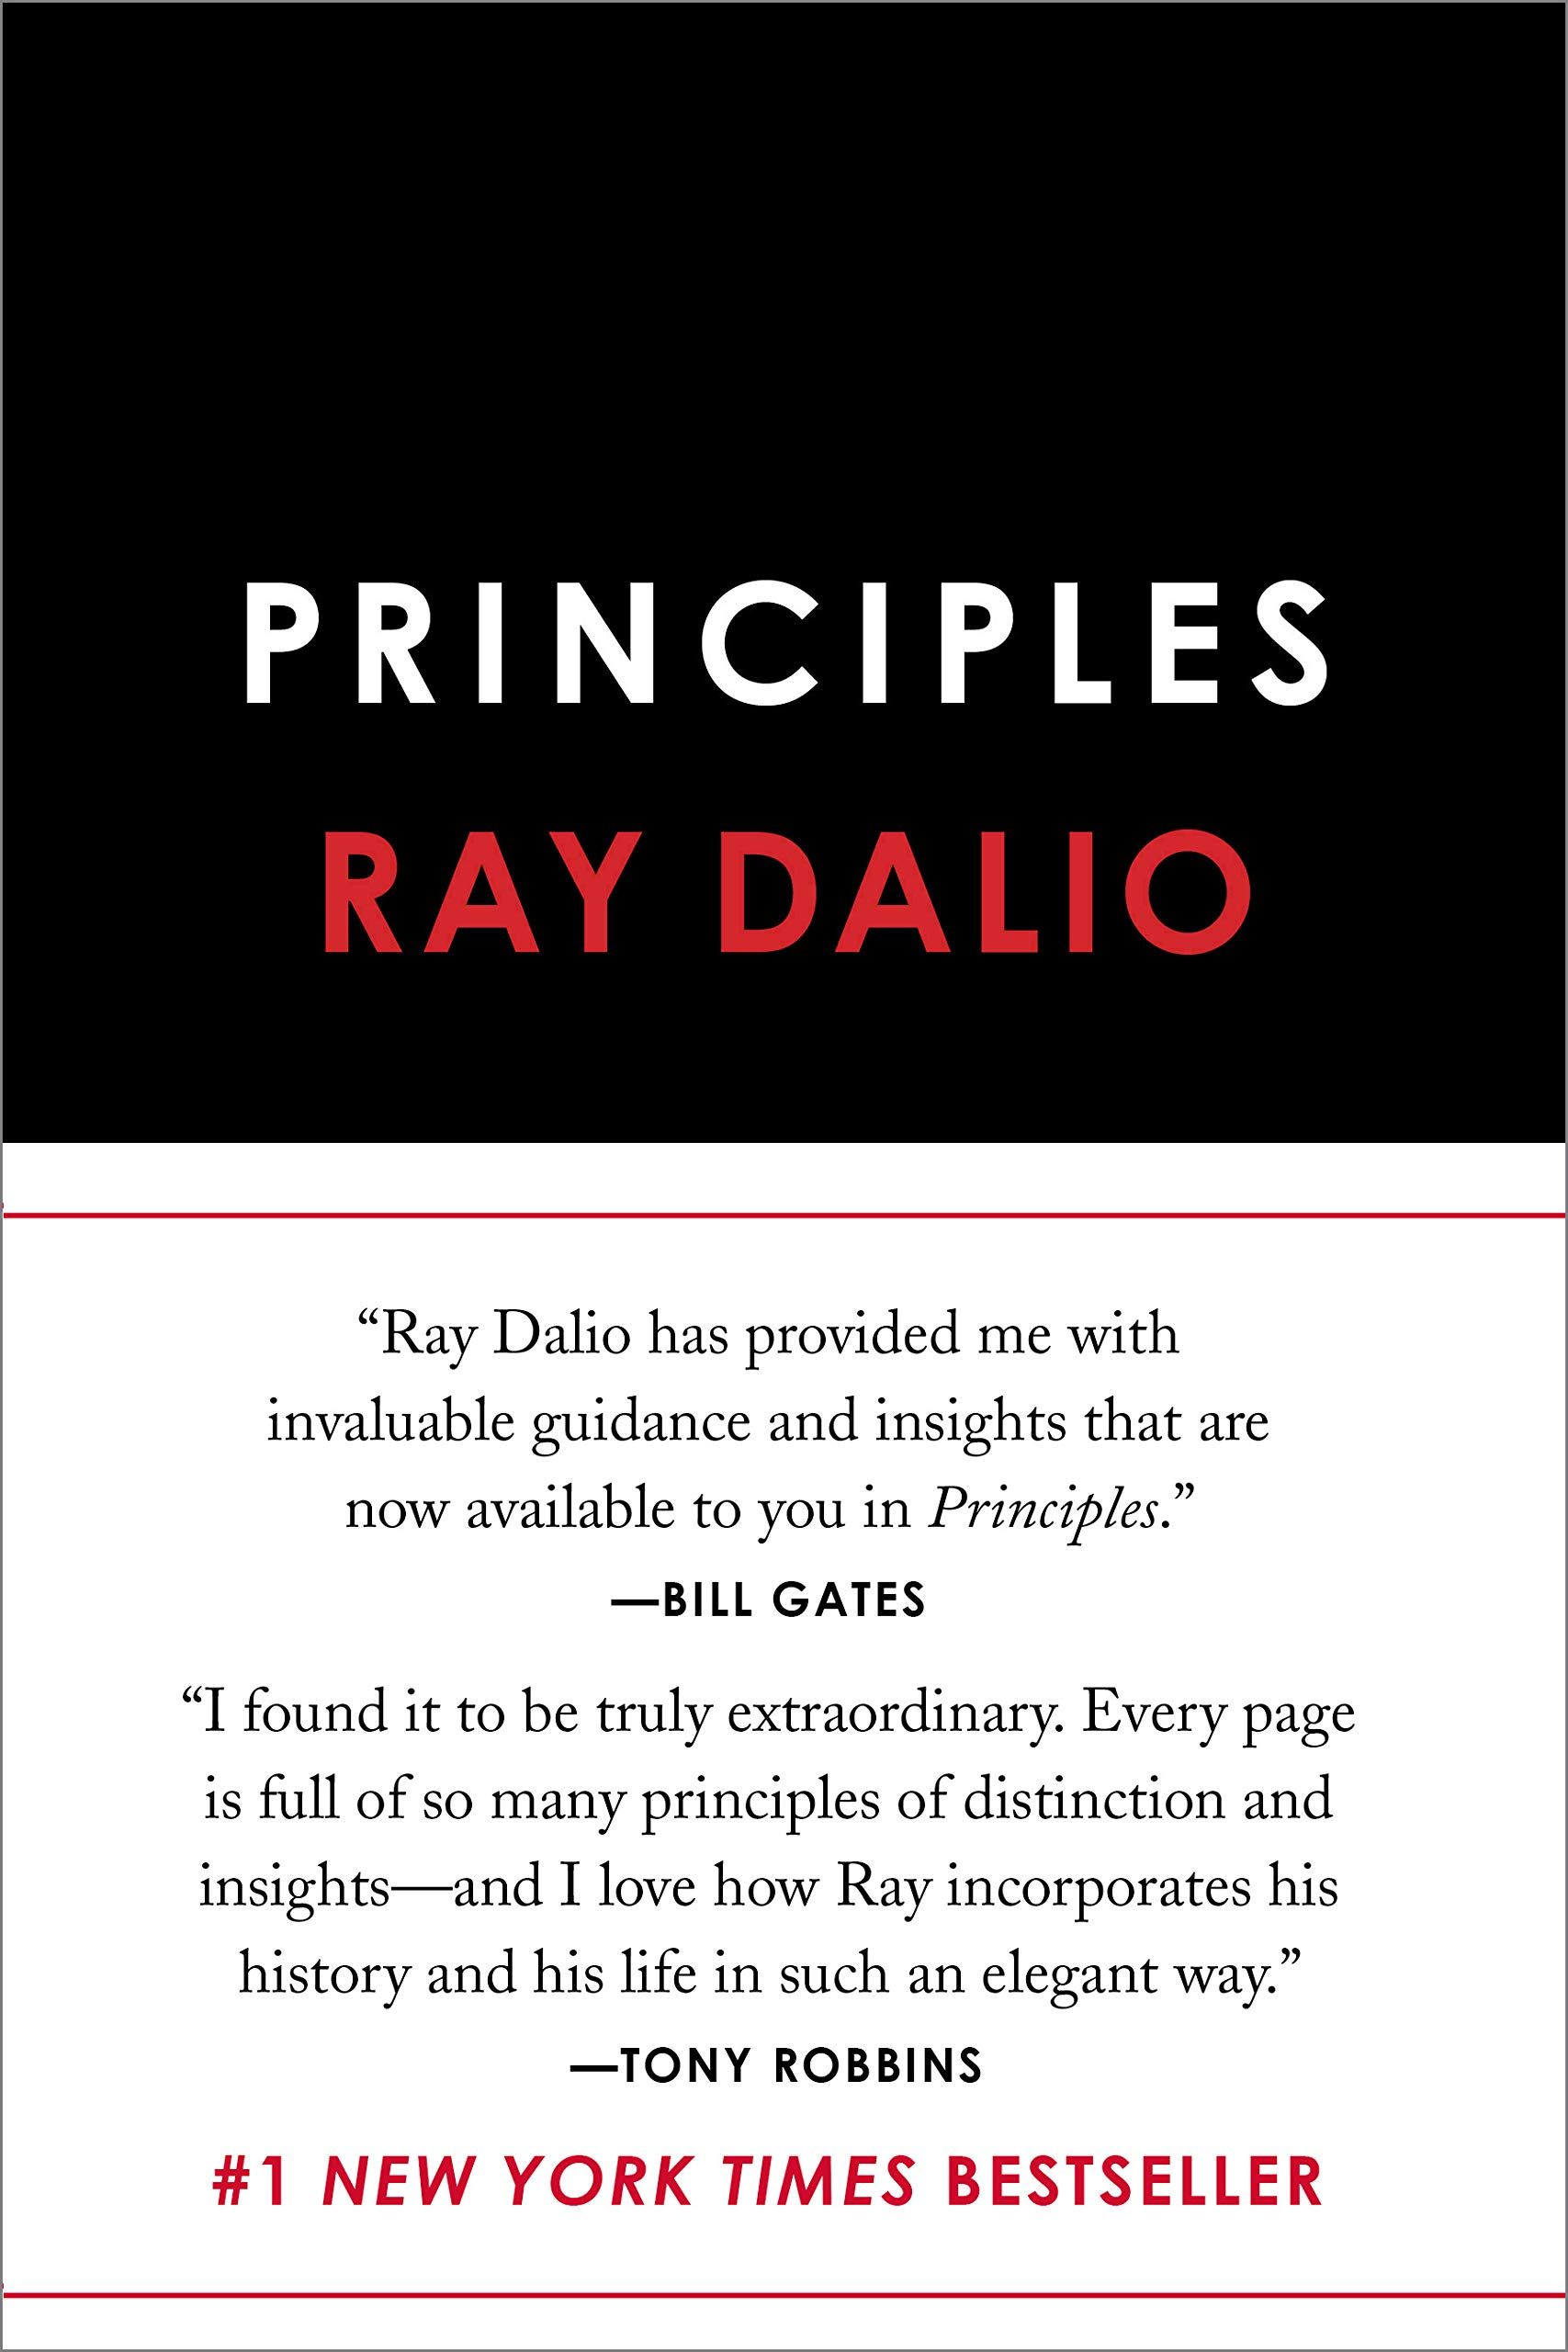 Principles - Ray Dalio.jpg